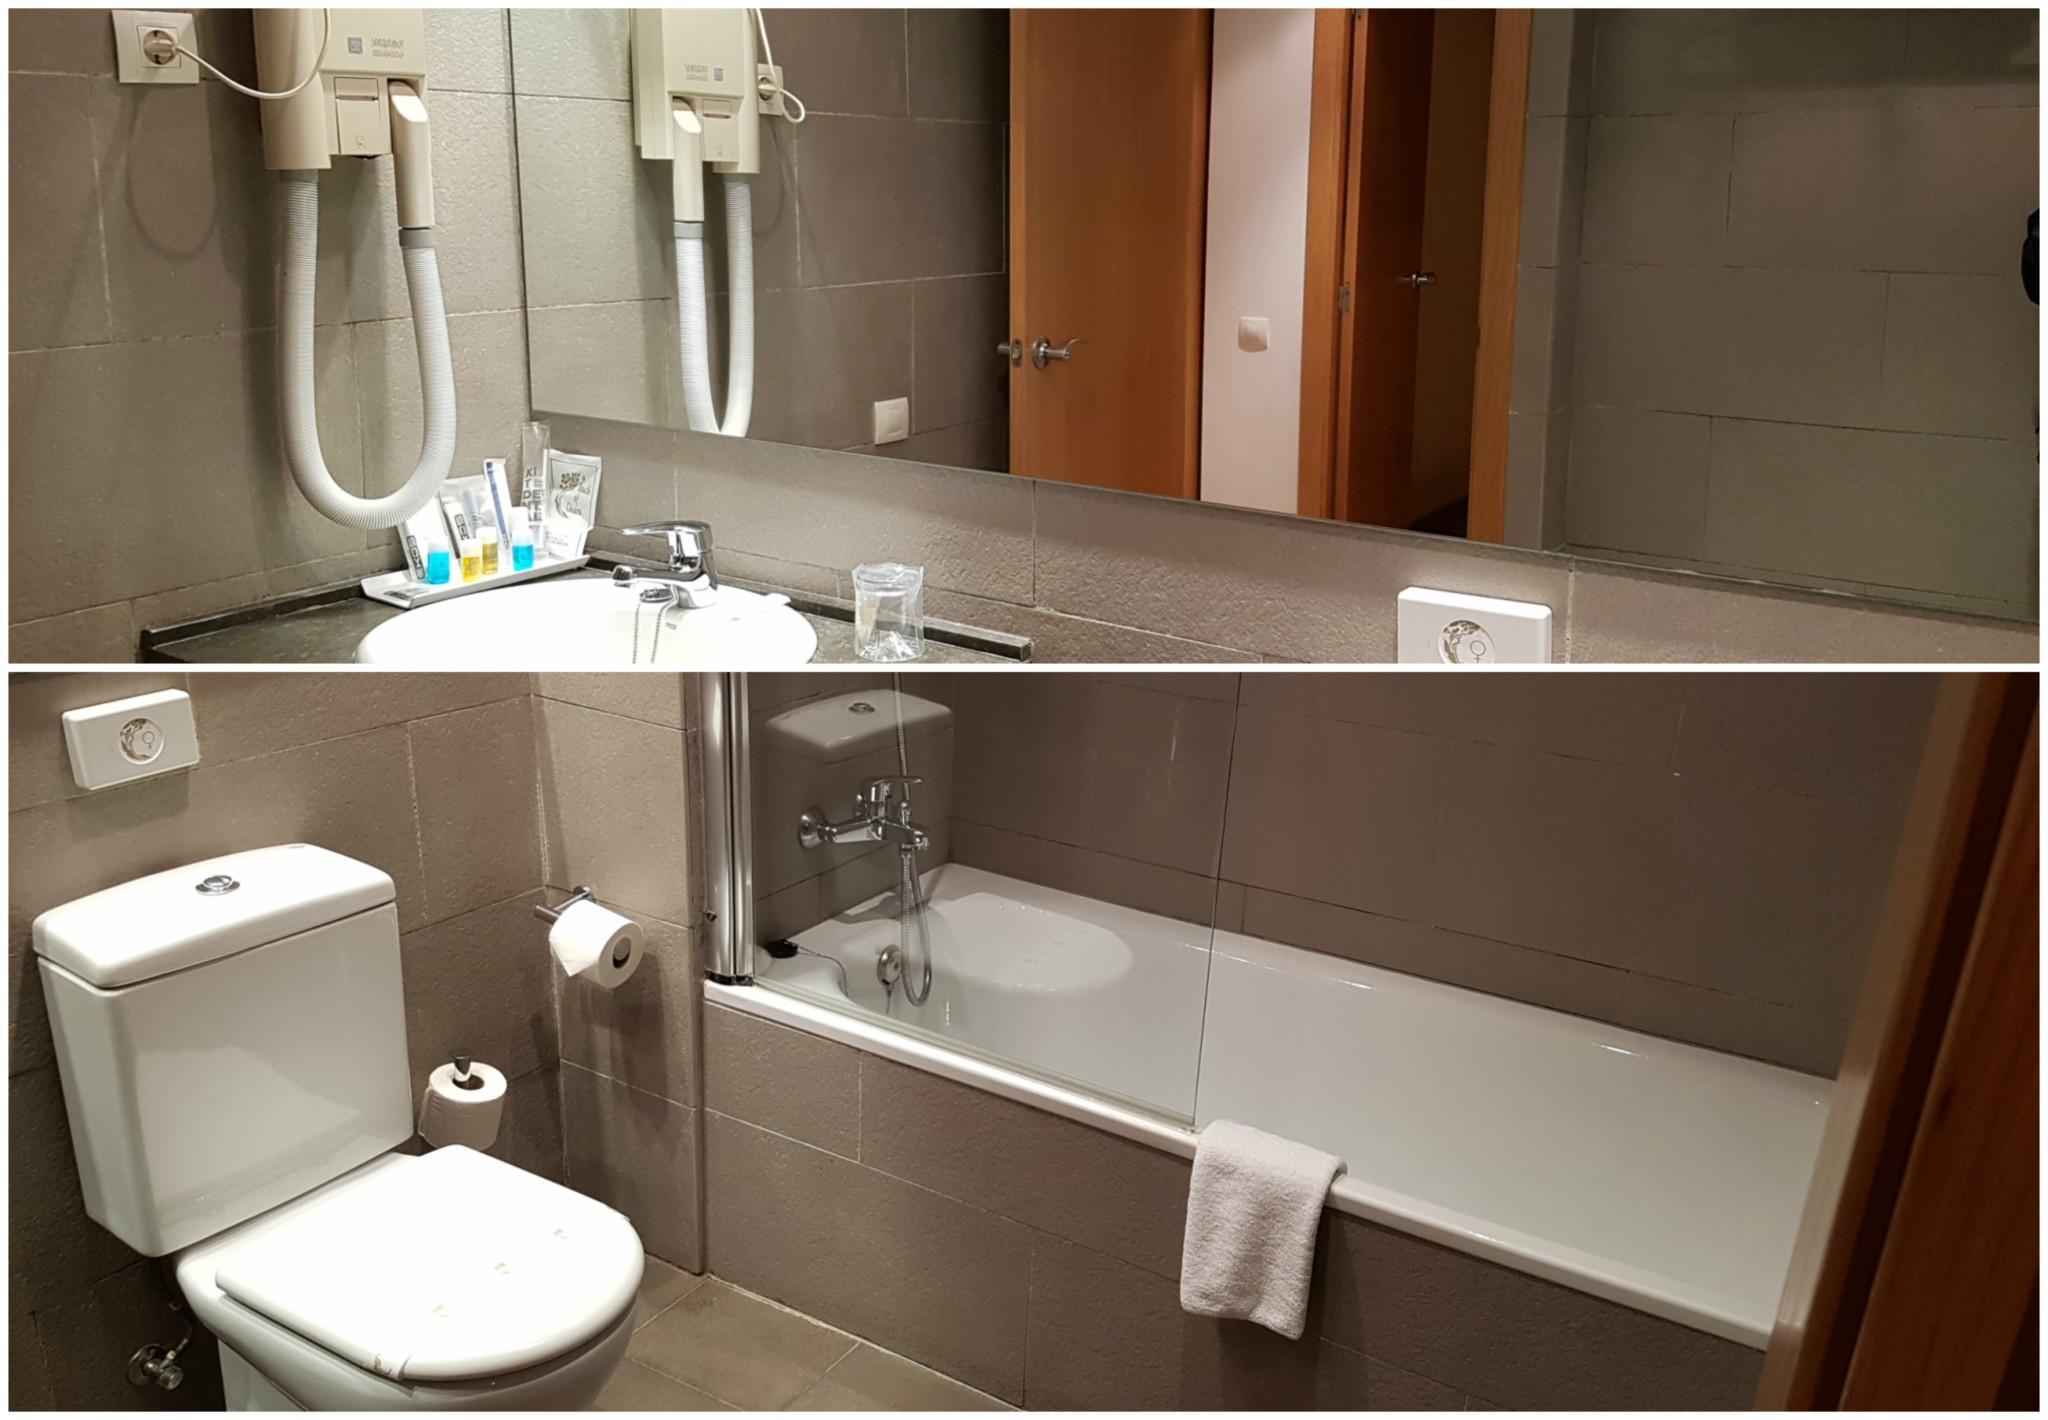 Baño aparthotel